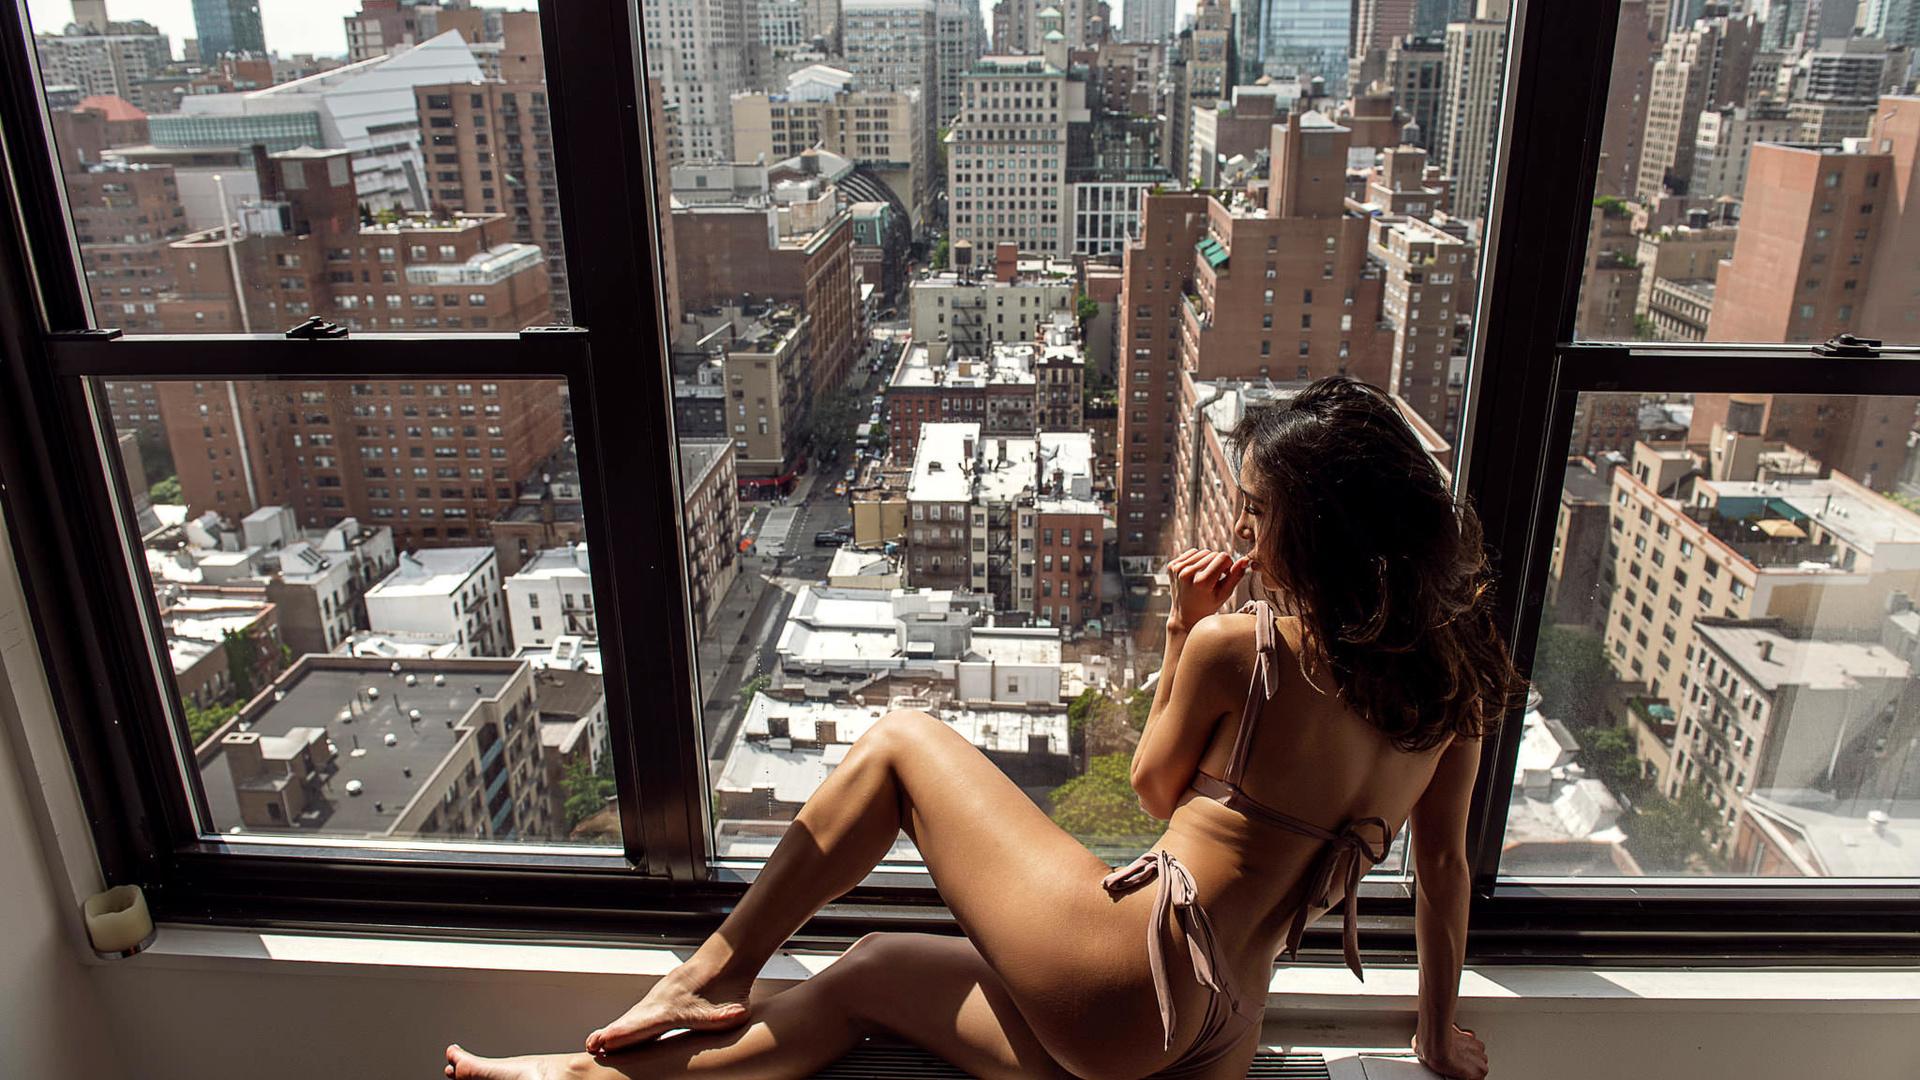 women, bikini, window, ass, sitting, brunette, building, finger on lips, candles